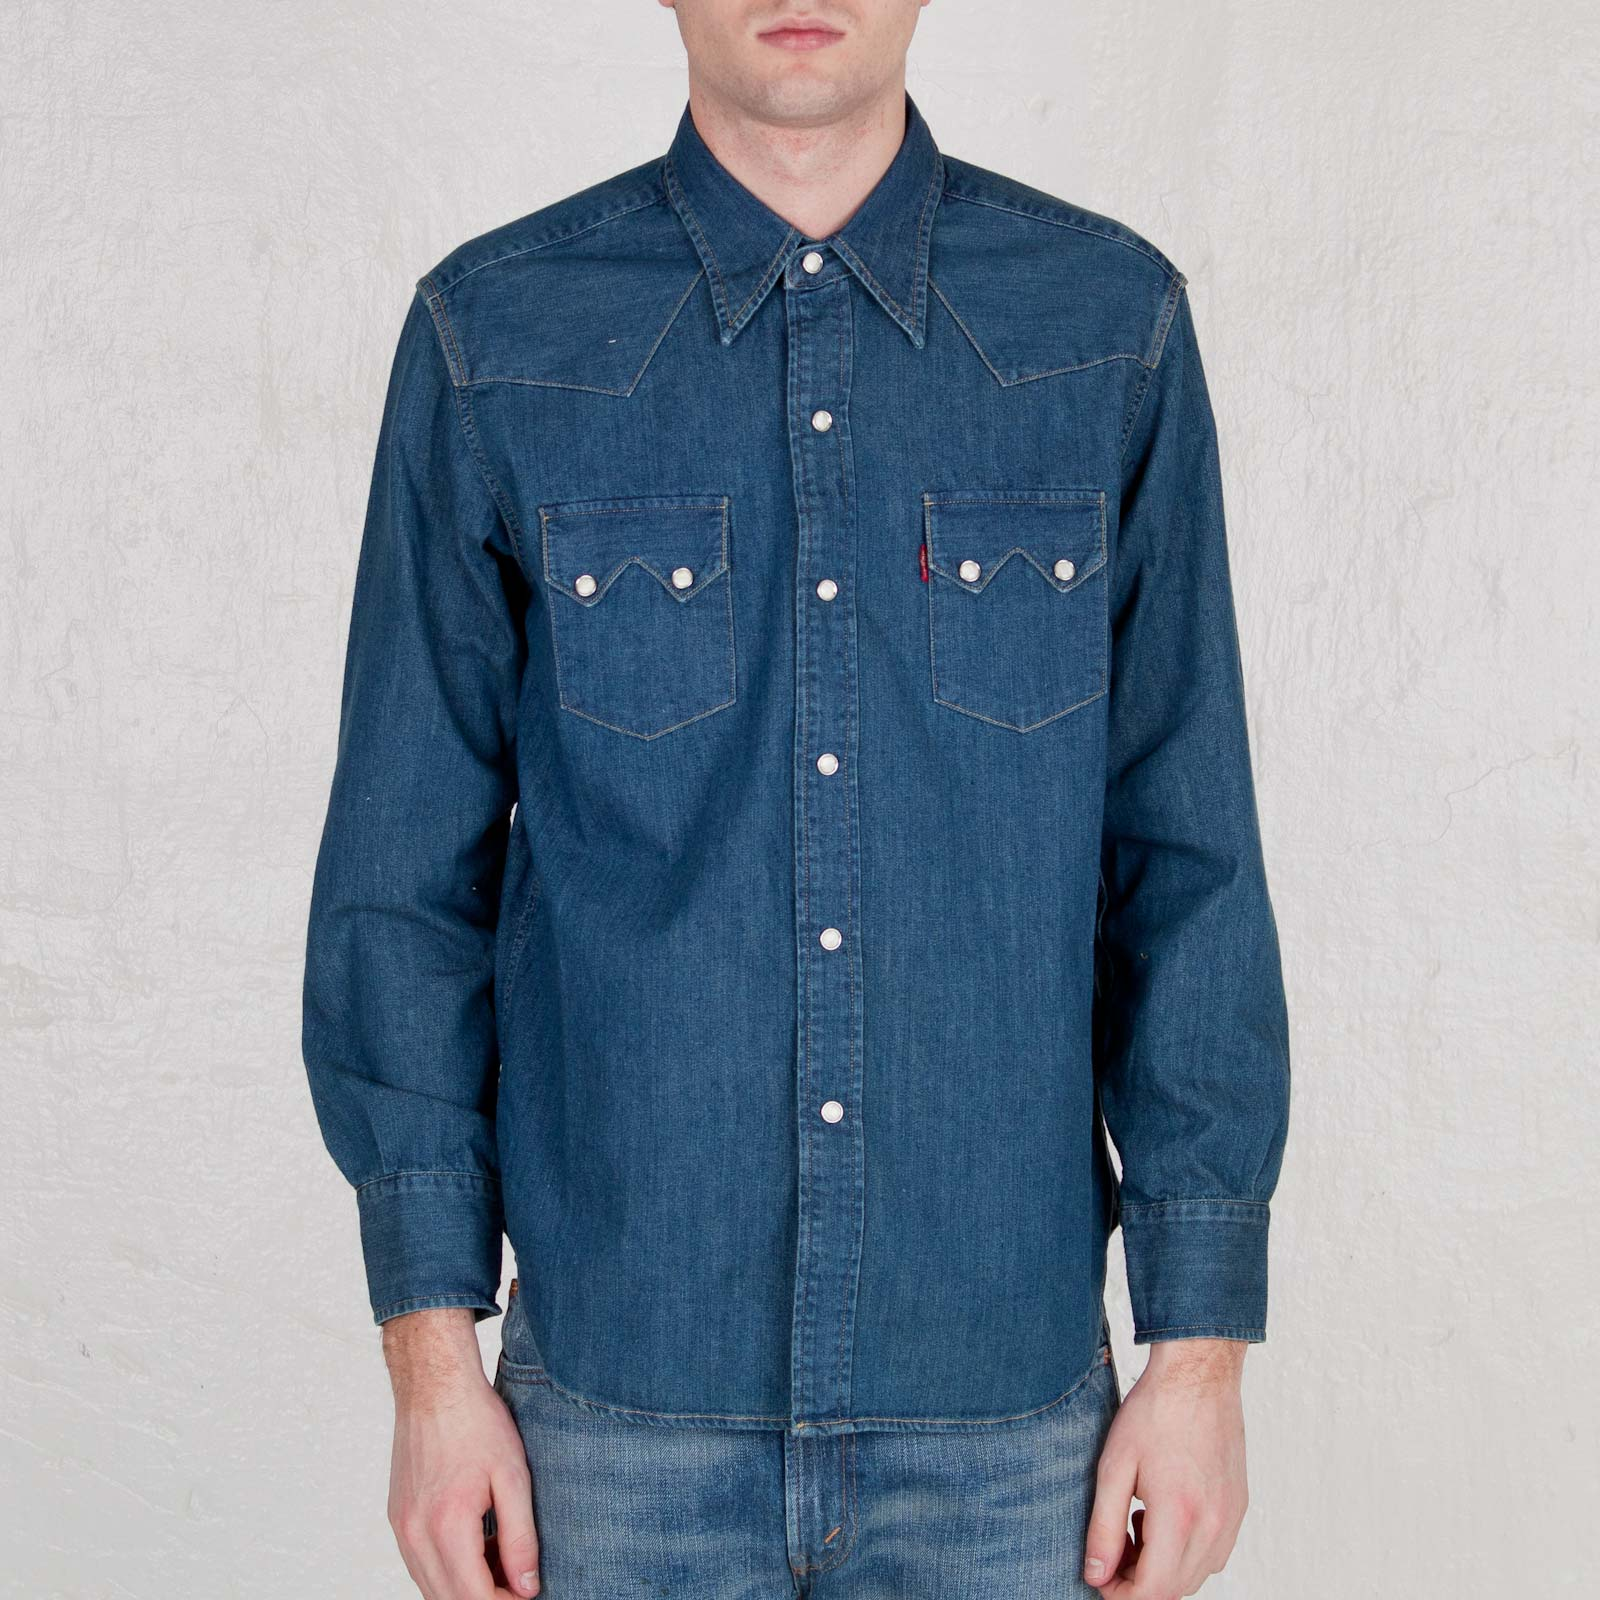 5c1891735fc2 Levis Vintage 1955 Sawtooth Denim Shirt - 07205-0022 ...